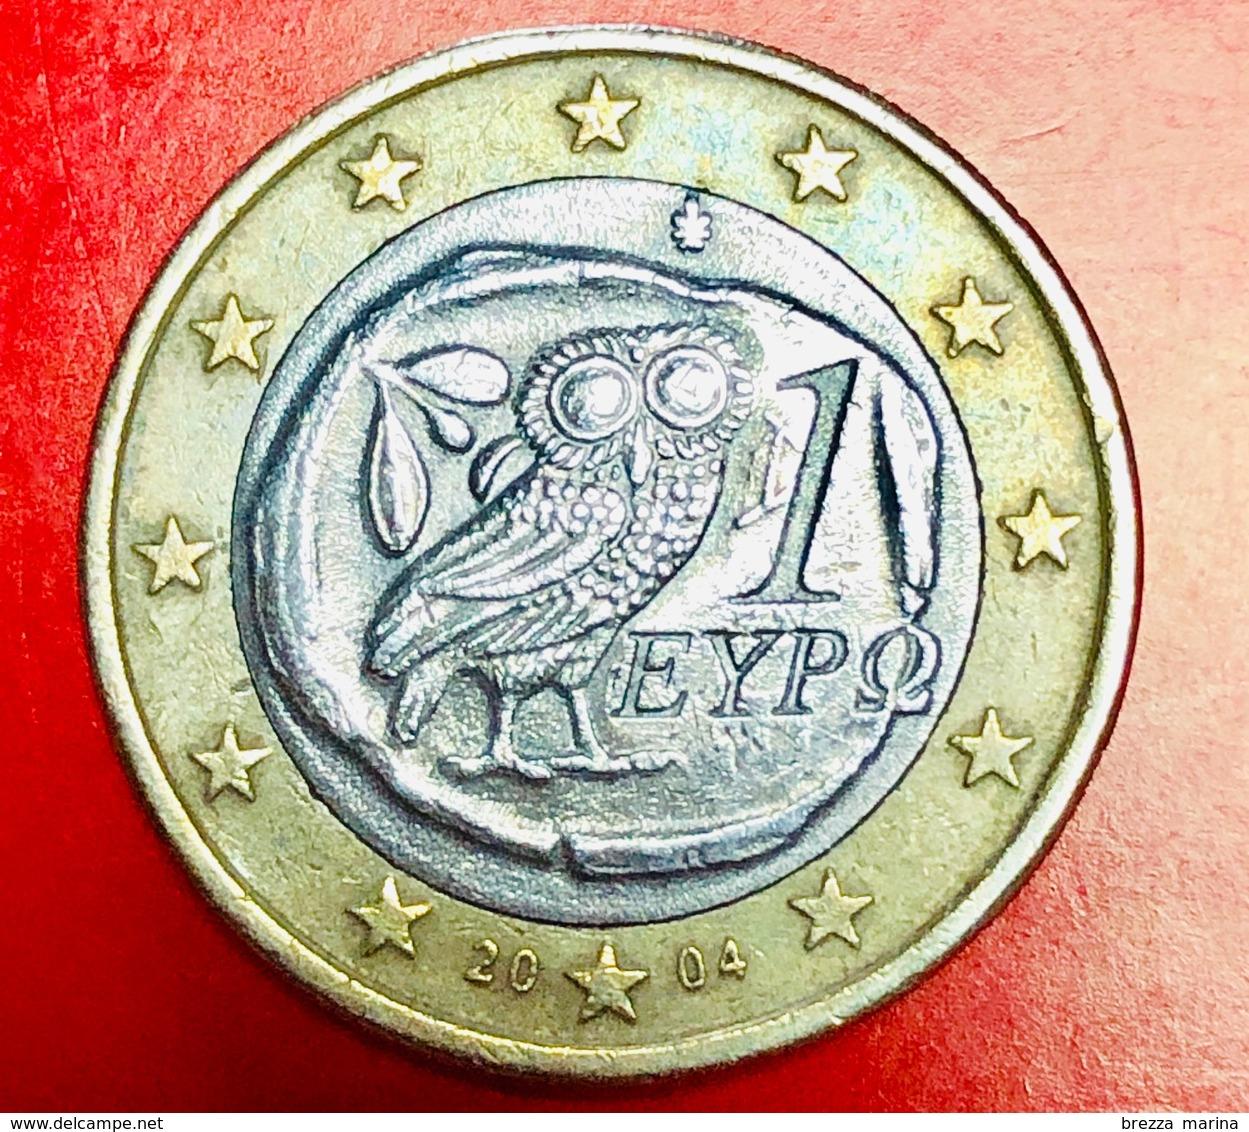 GRECIA - 2004 - Moneta - Civetta - Euro - 1.00 - Grèce